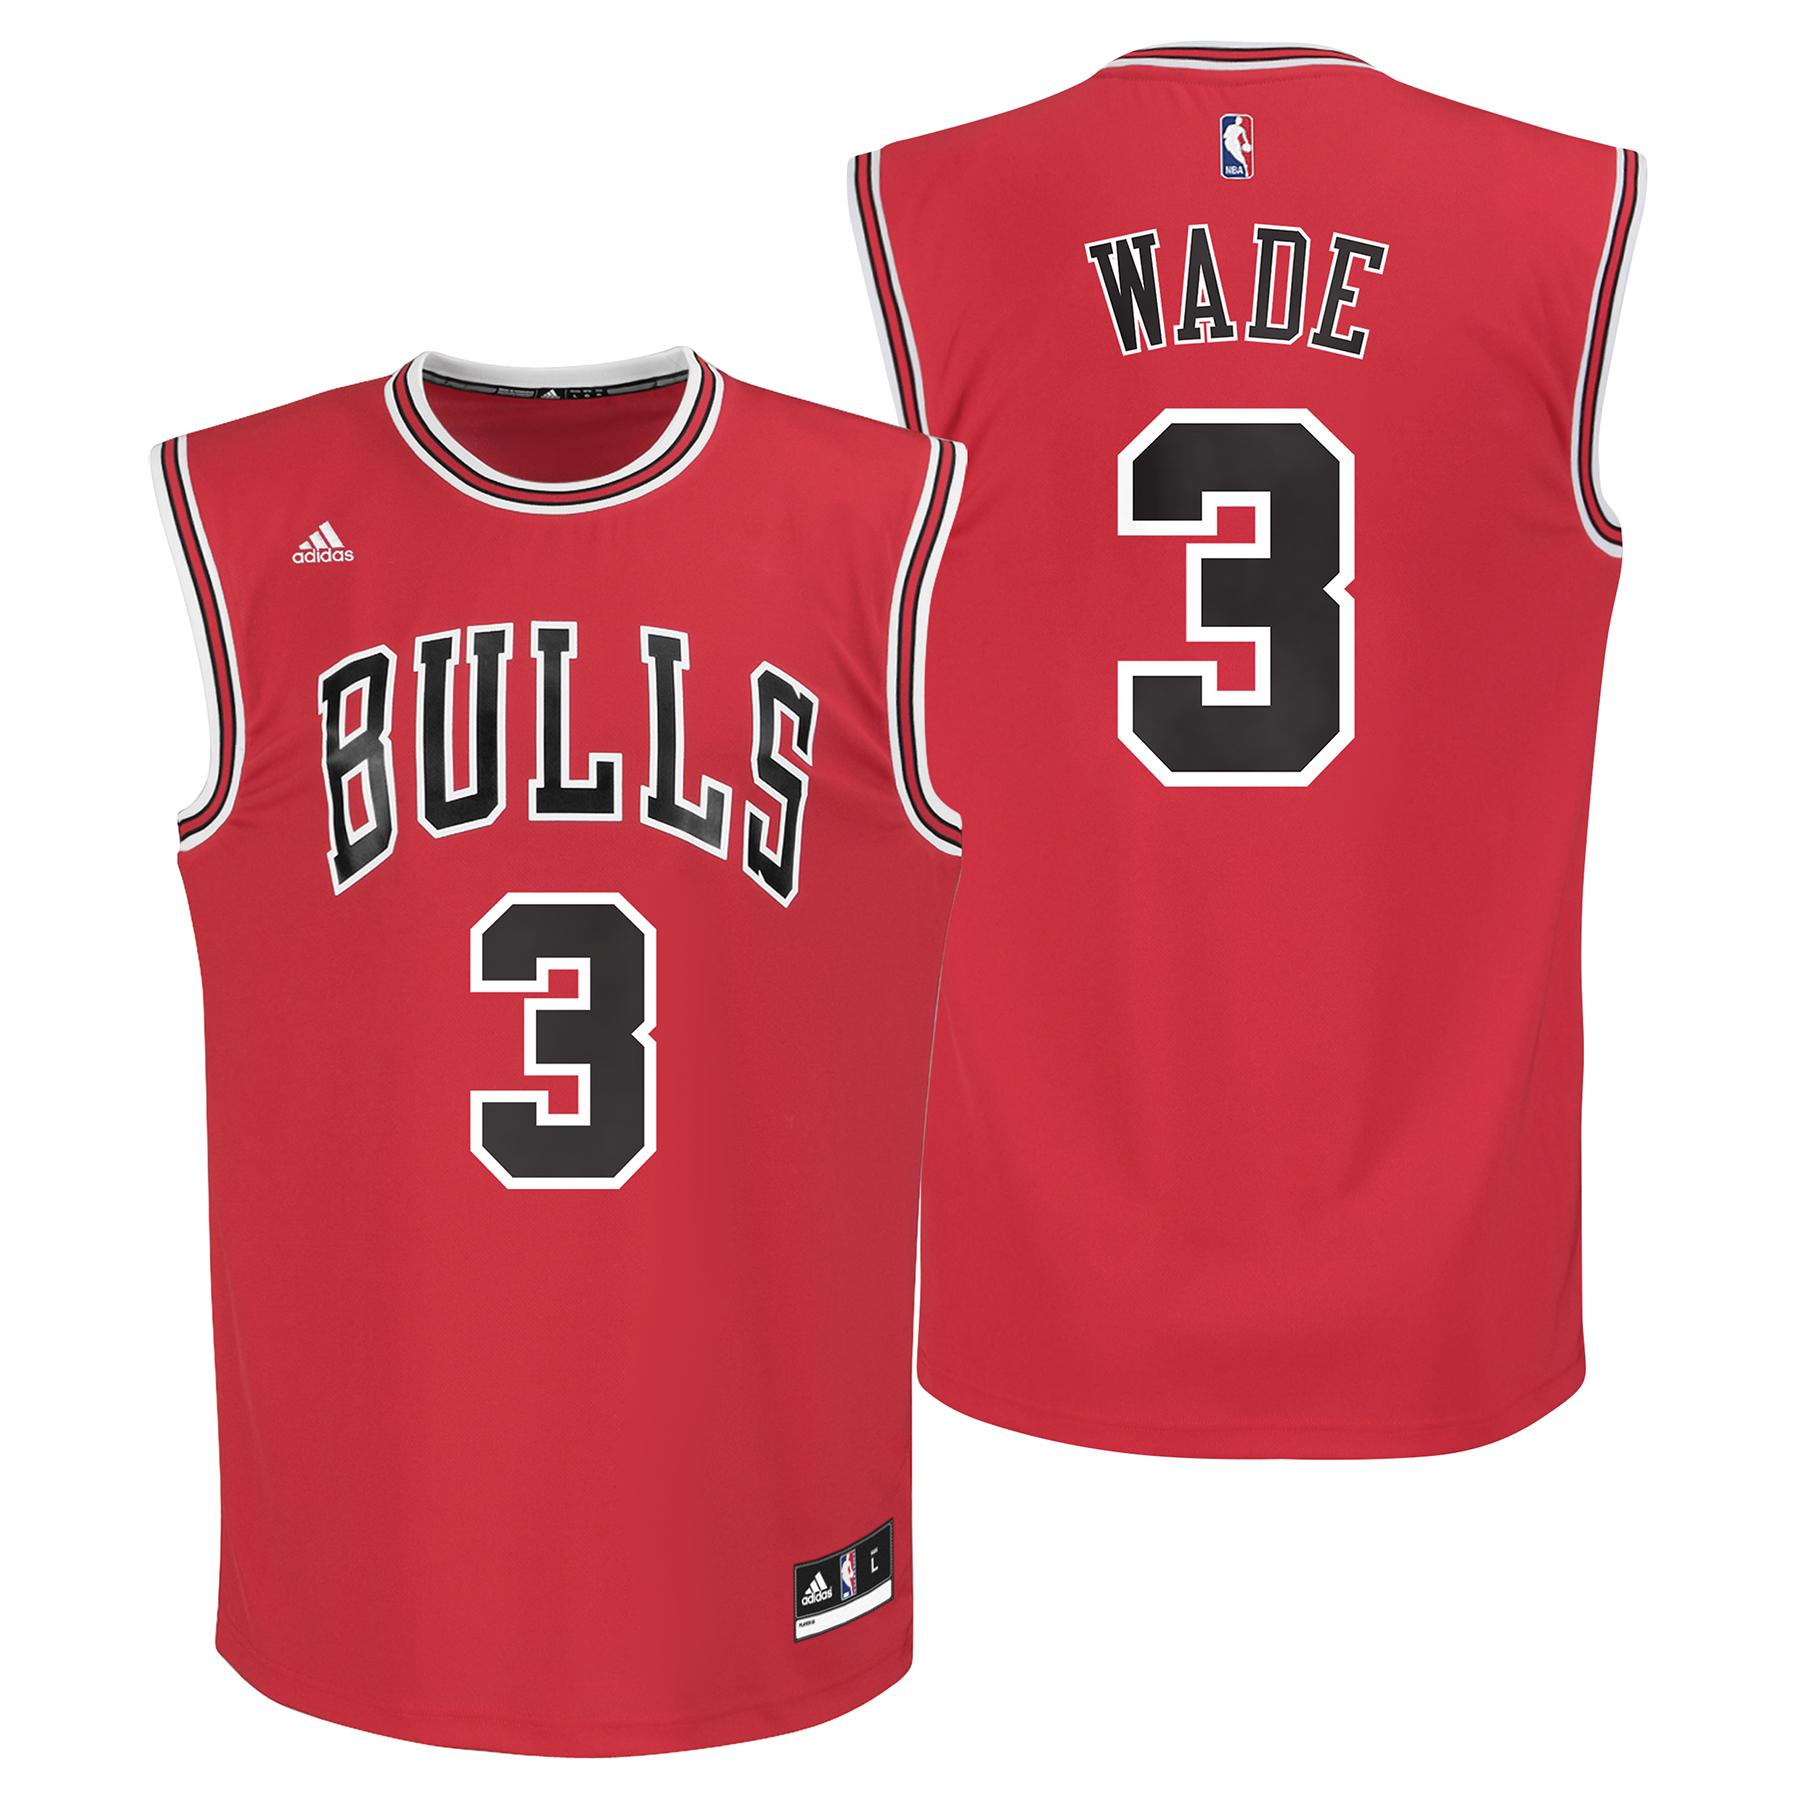 Chicago Bulls Road Replica Jersey - Dwyane Wade - Youth